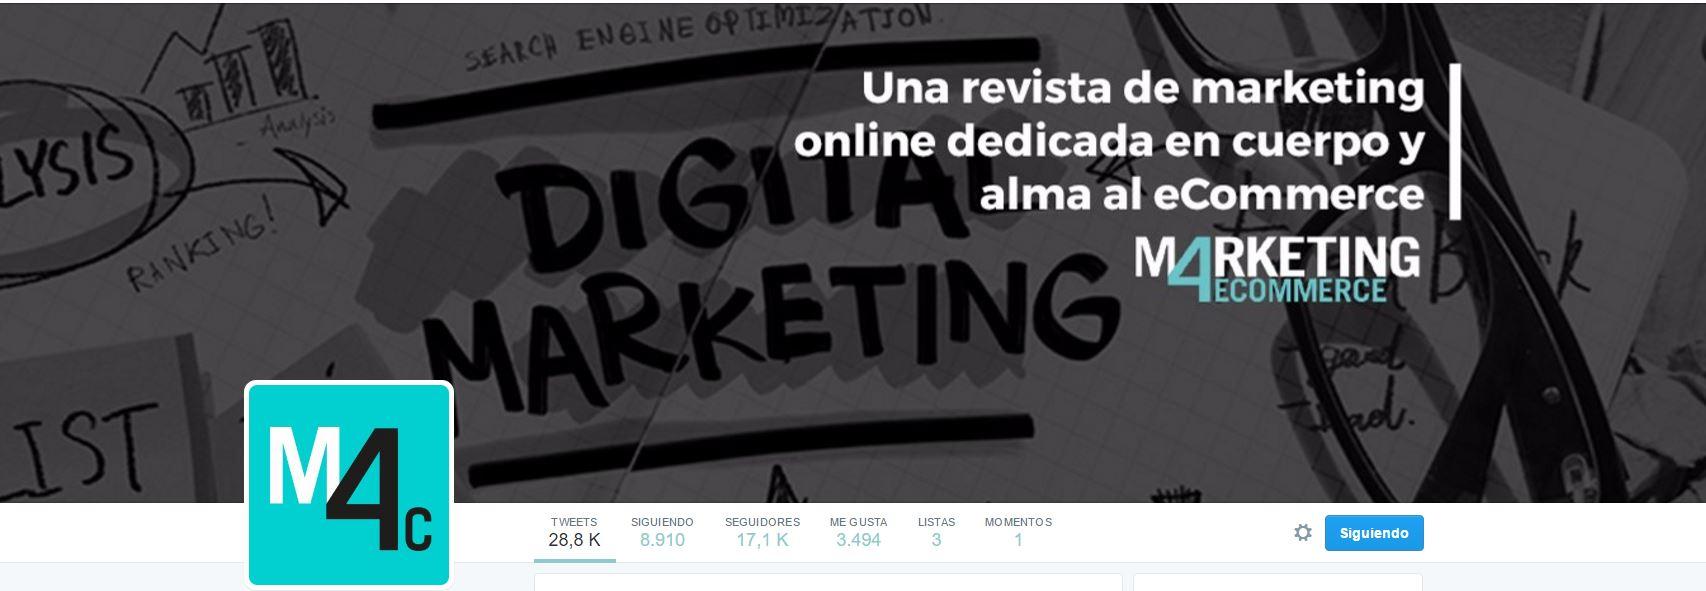 Marketing4Commerce